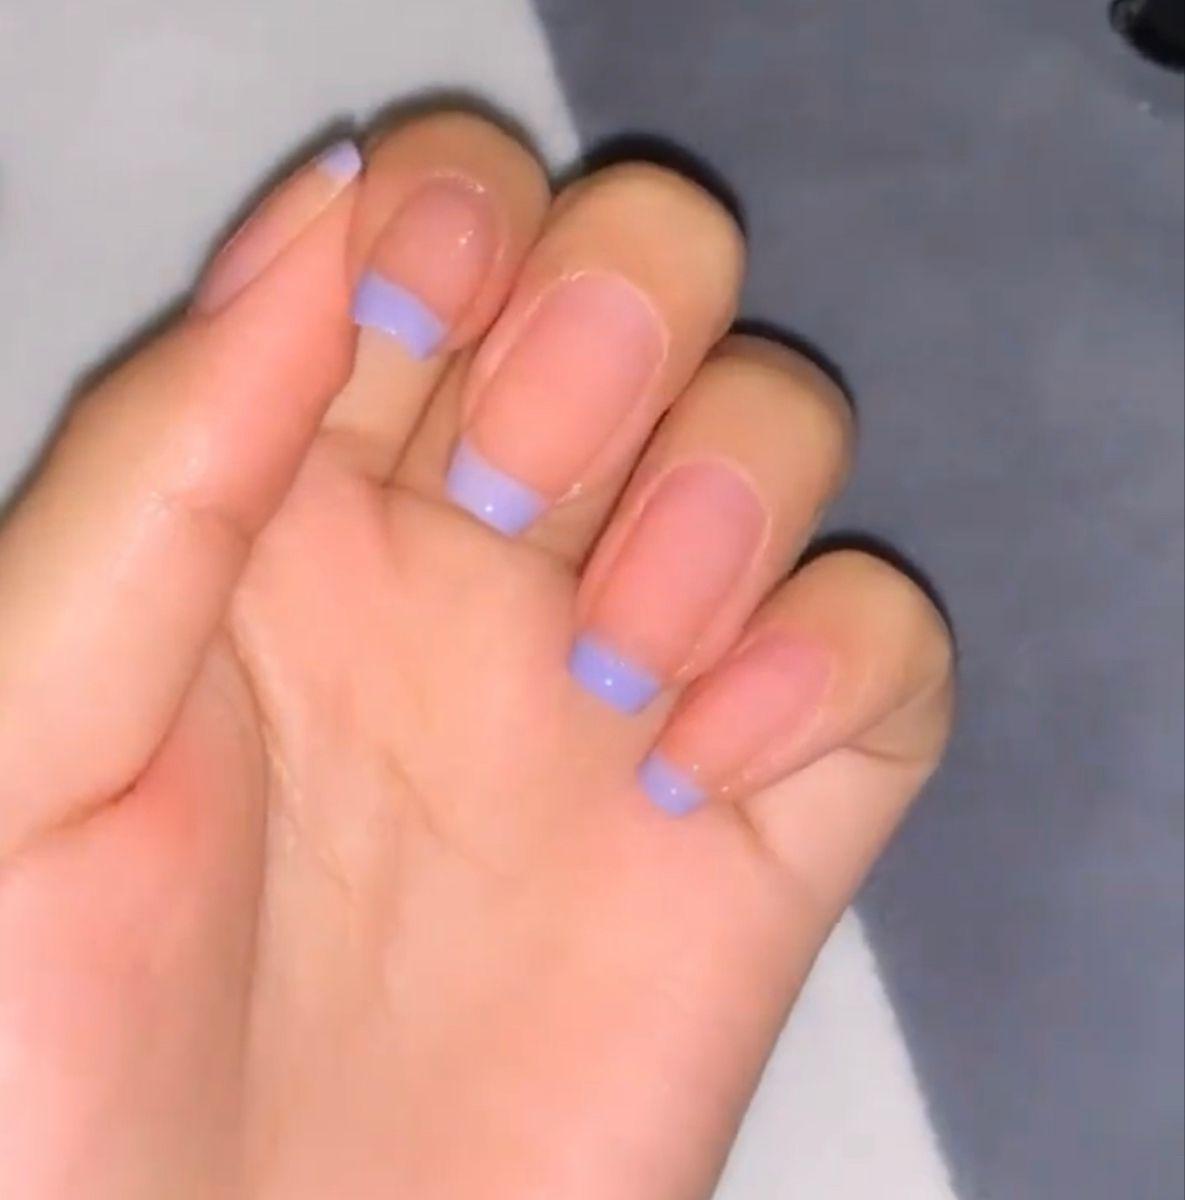 #nails #nailsdesign #purple #purplenails ✨